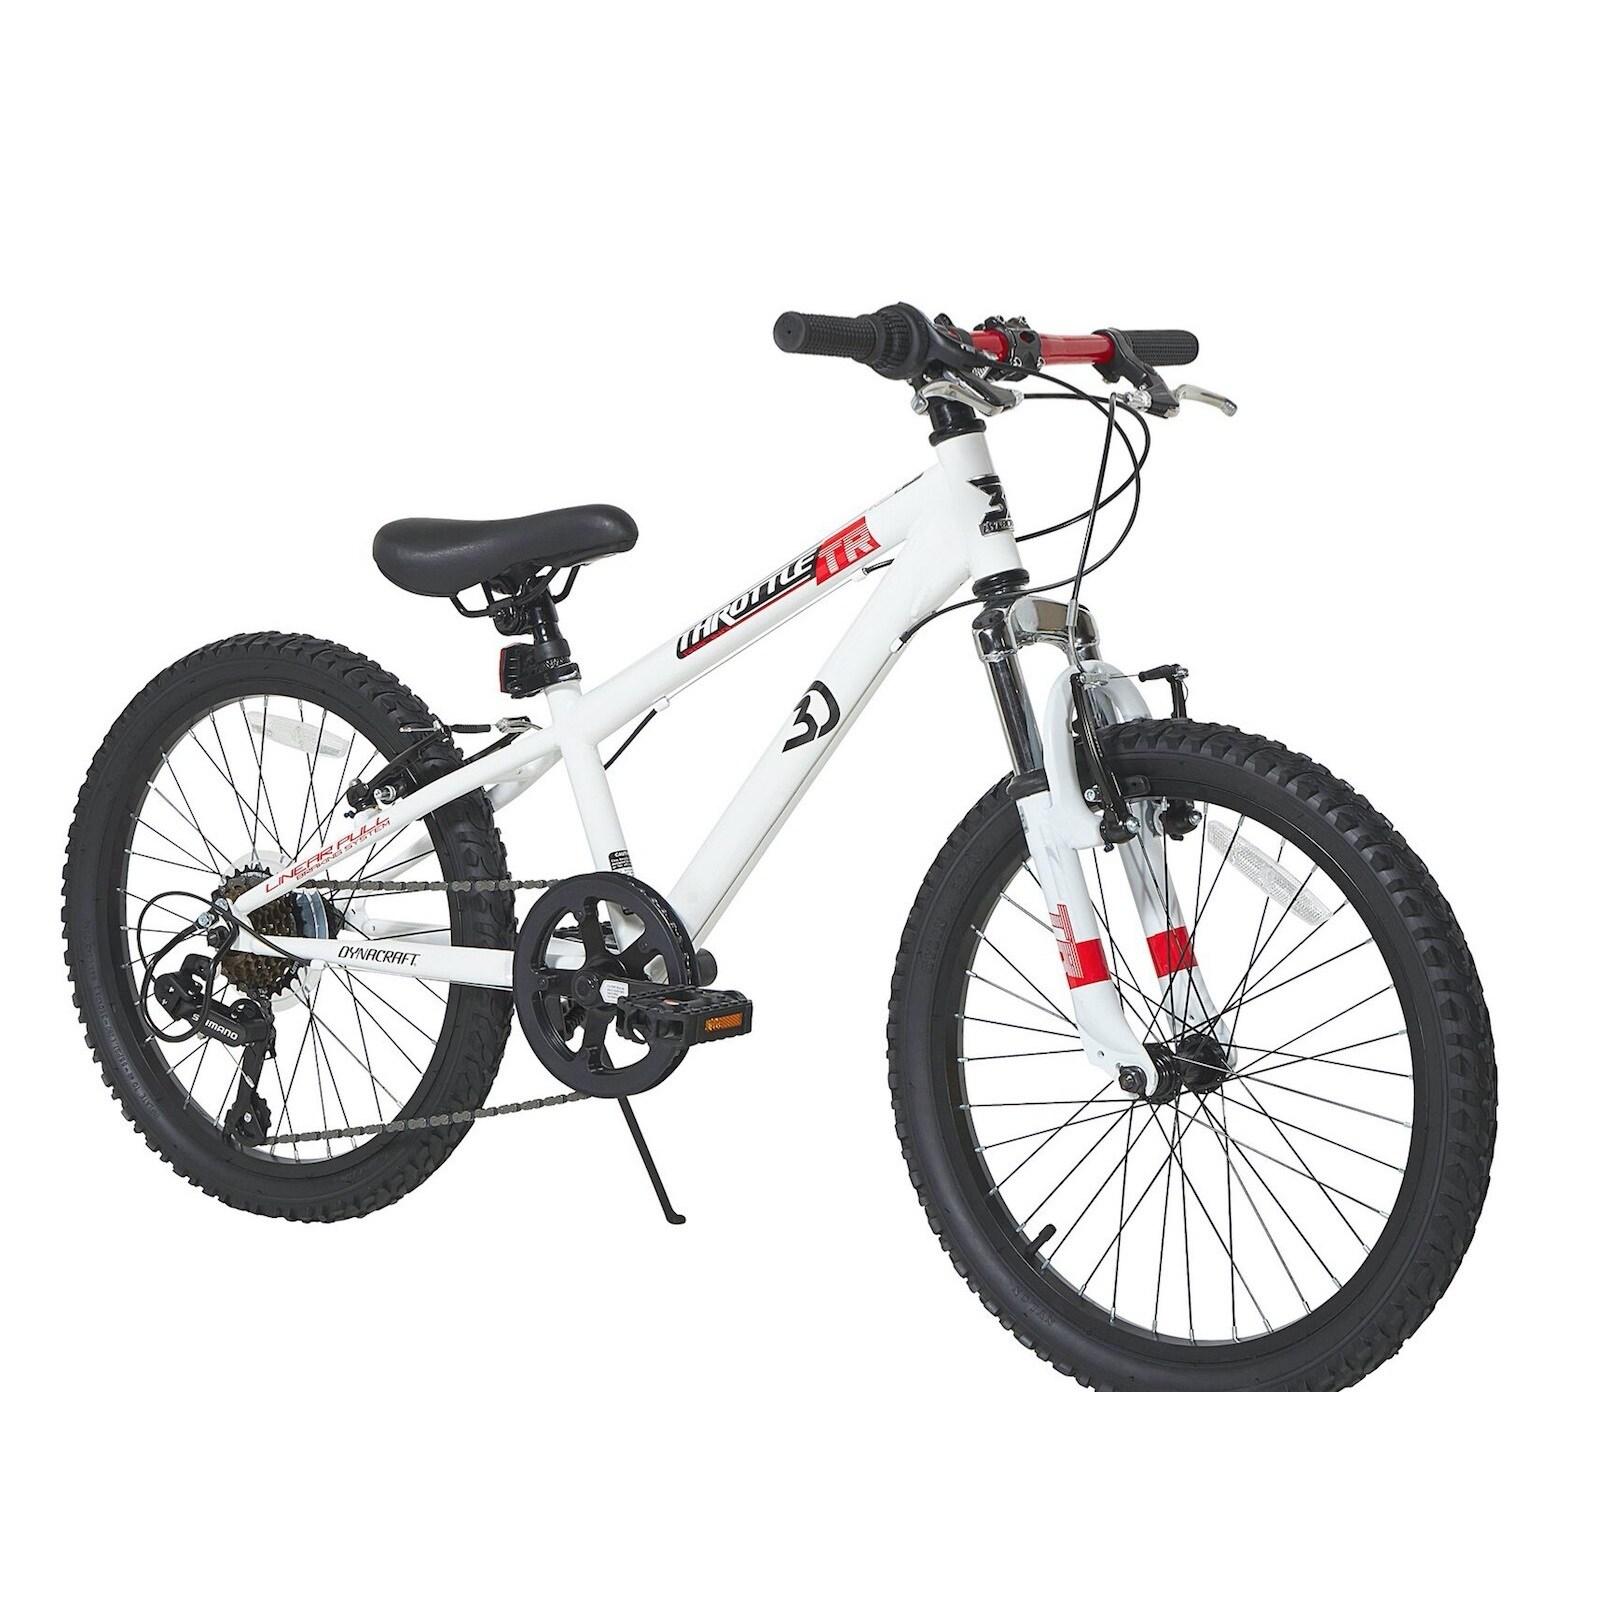 "Dynacraft 20-inch Throttle Bike (20""), White"